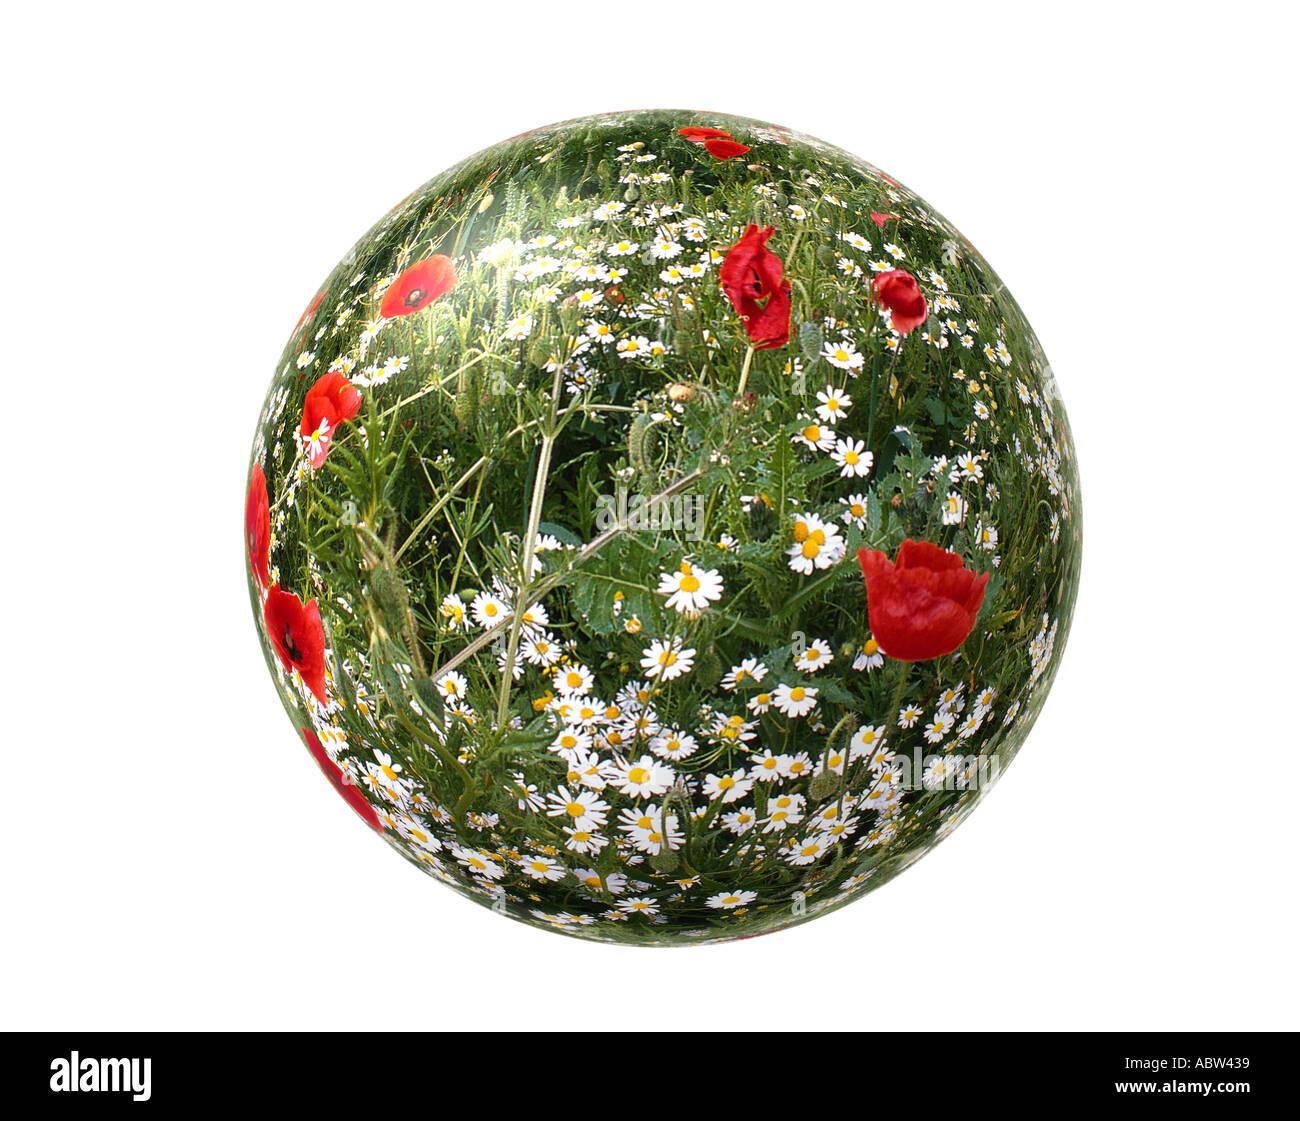 ÖKOLOGISCHEN Konzept: Unsere Welt Stockbild